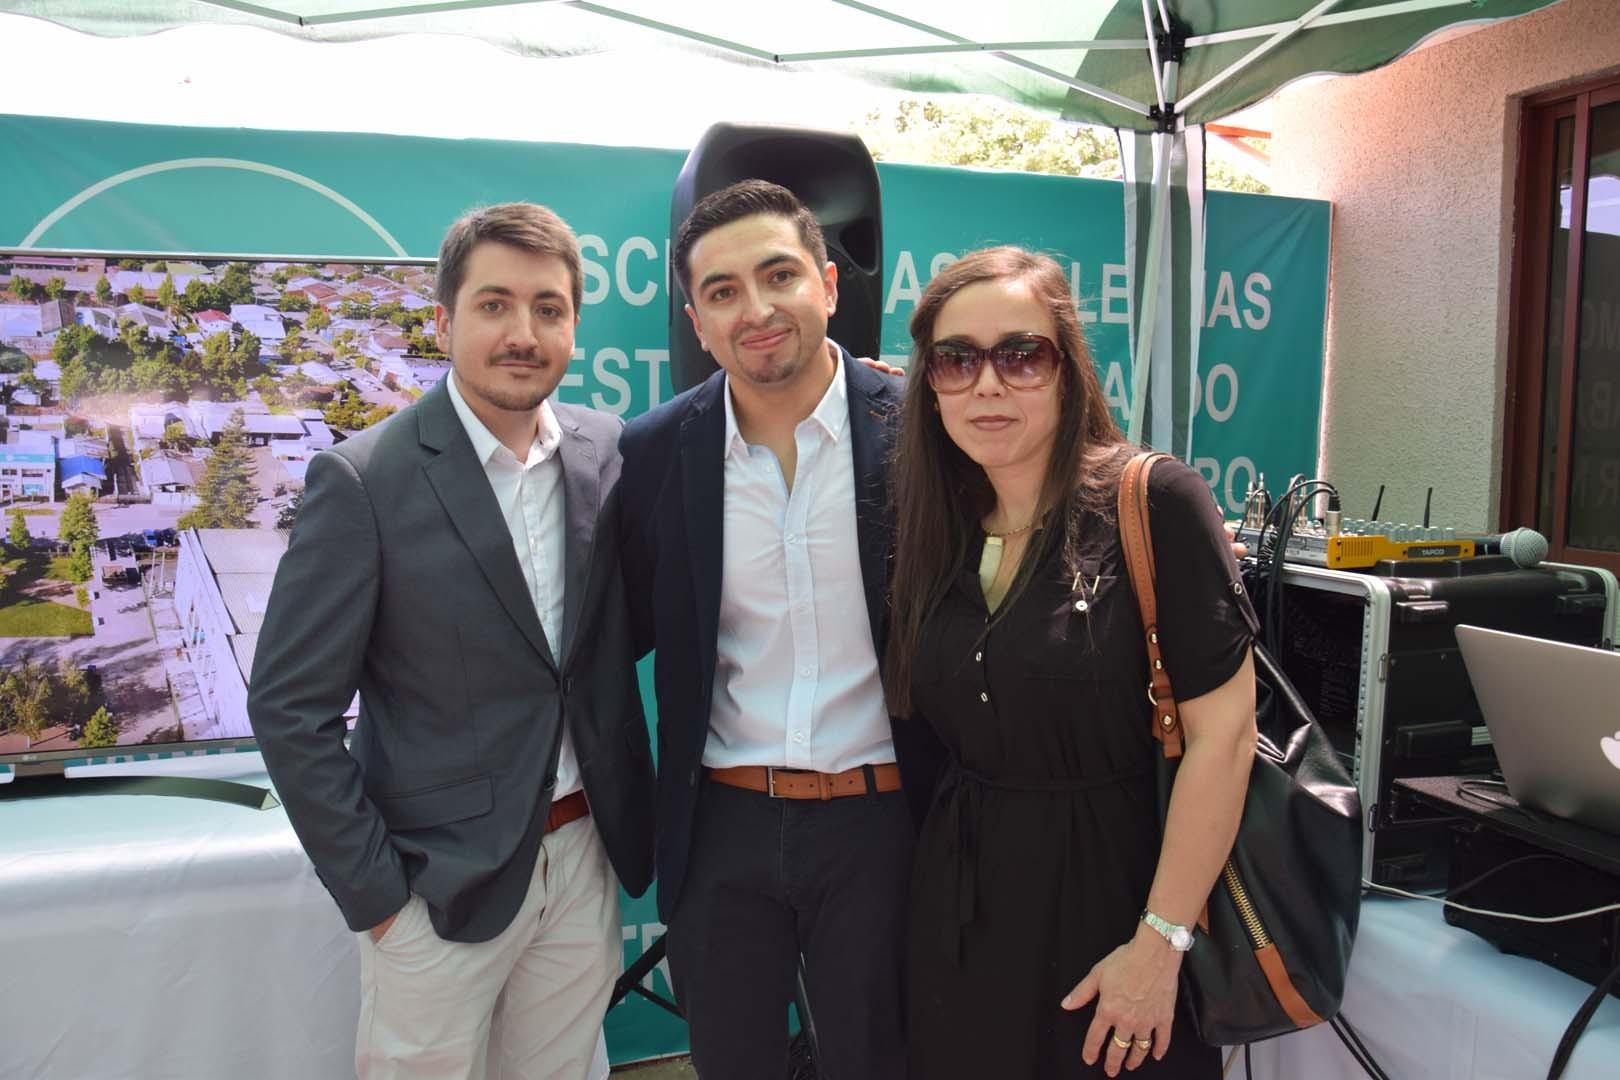 Raimundo Serrano, Rafael Ramírez y Lorena León